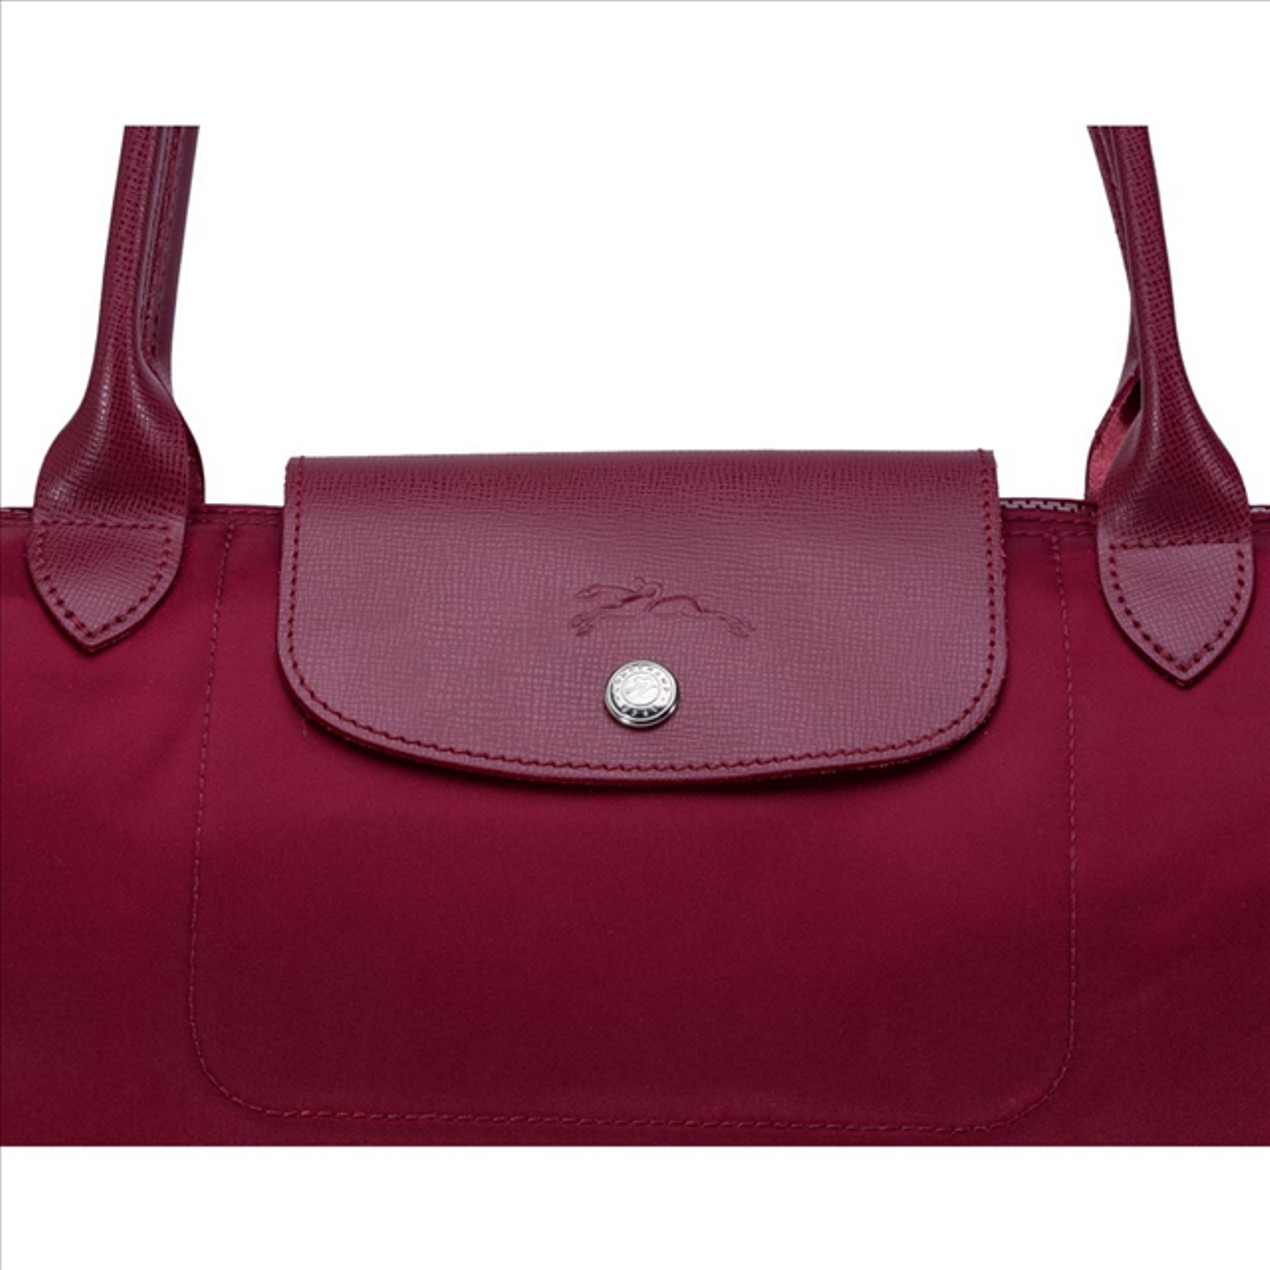 Longchamp Le Pliage Neo Large Tote Bag Wine 1899578009 Authentic Tanga Small